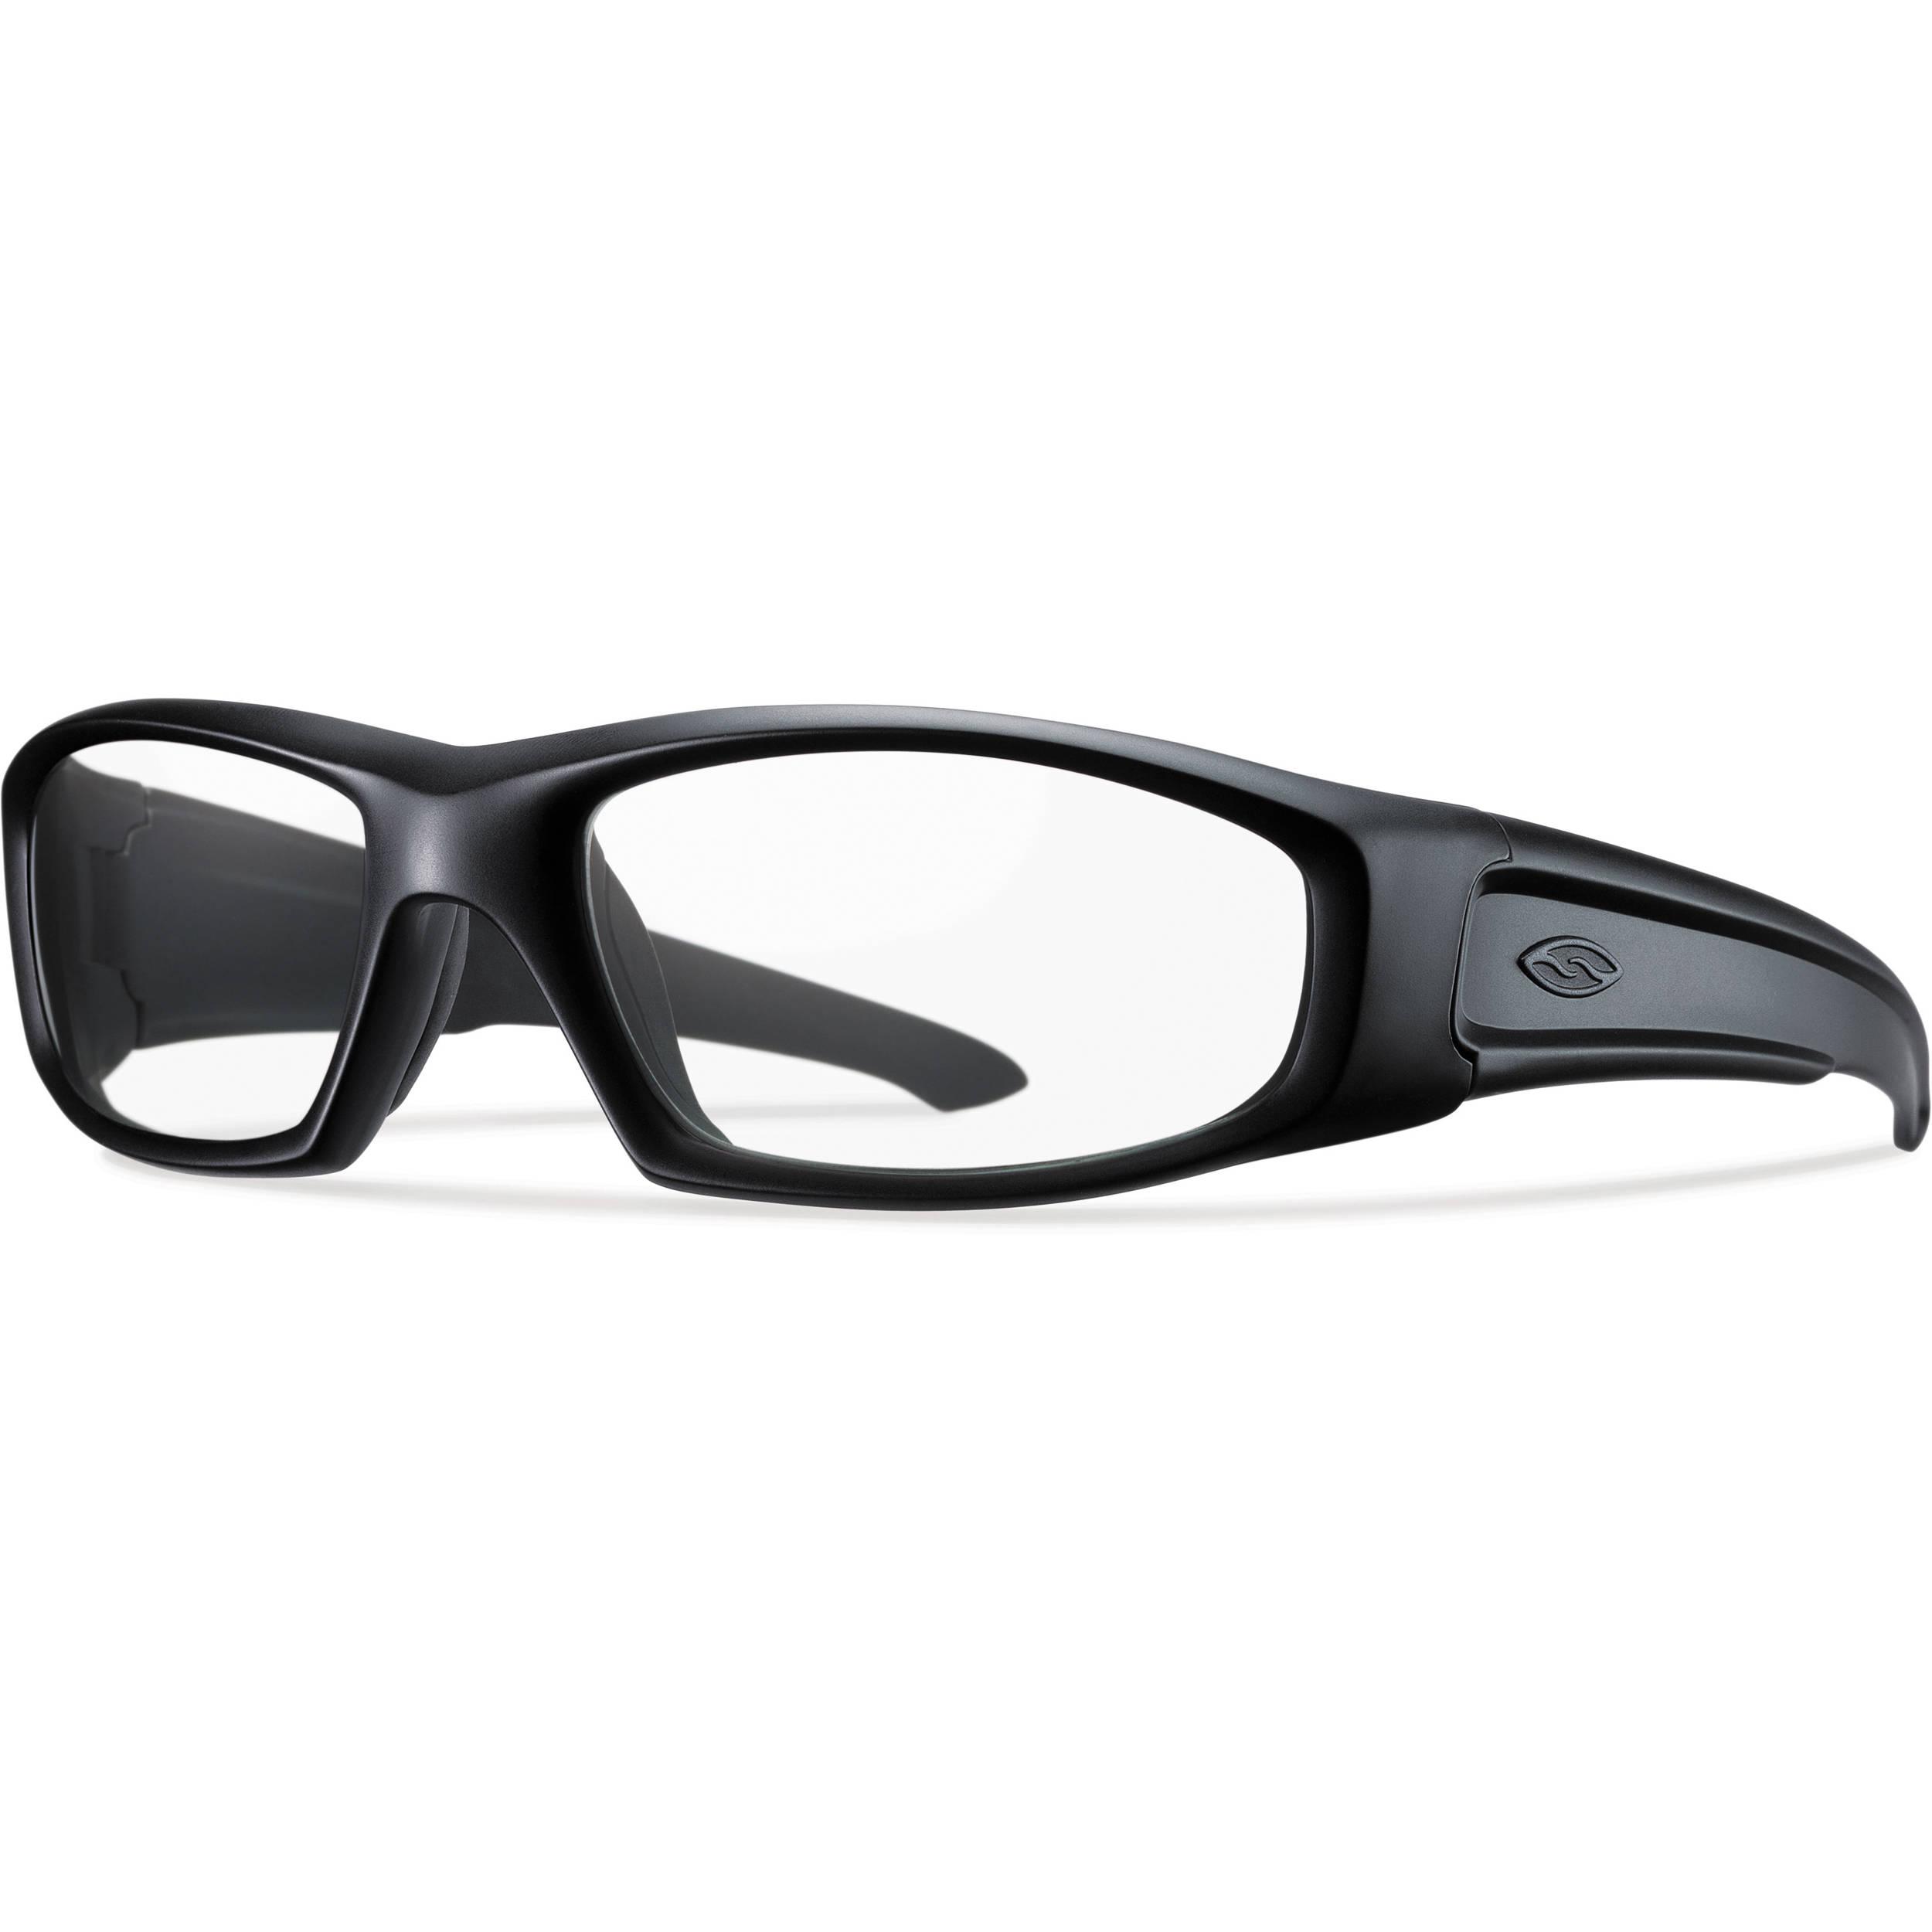 e246d05e93 Smith Optics Hudson Elite Tactical Sunglasses (Black - Clear Lens)